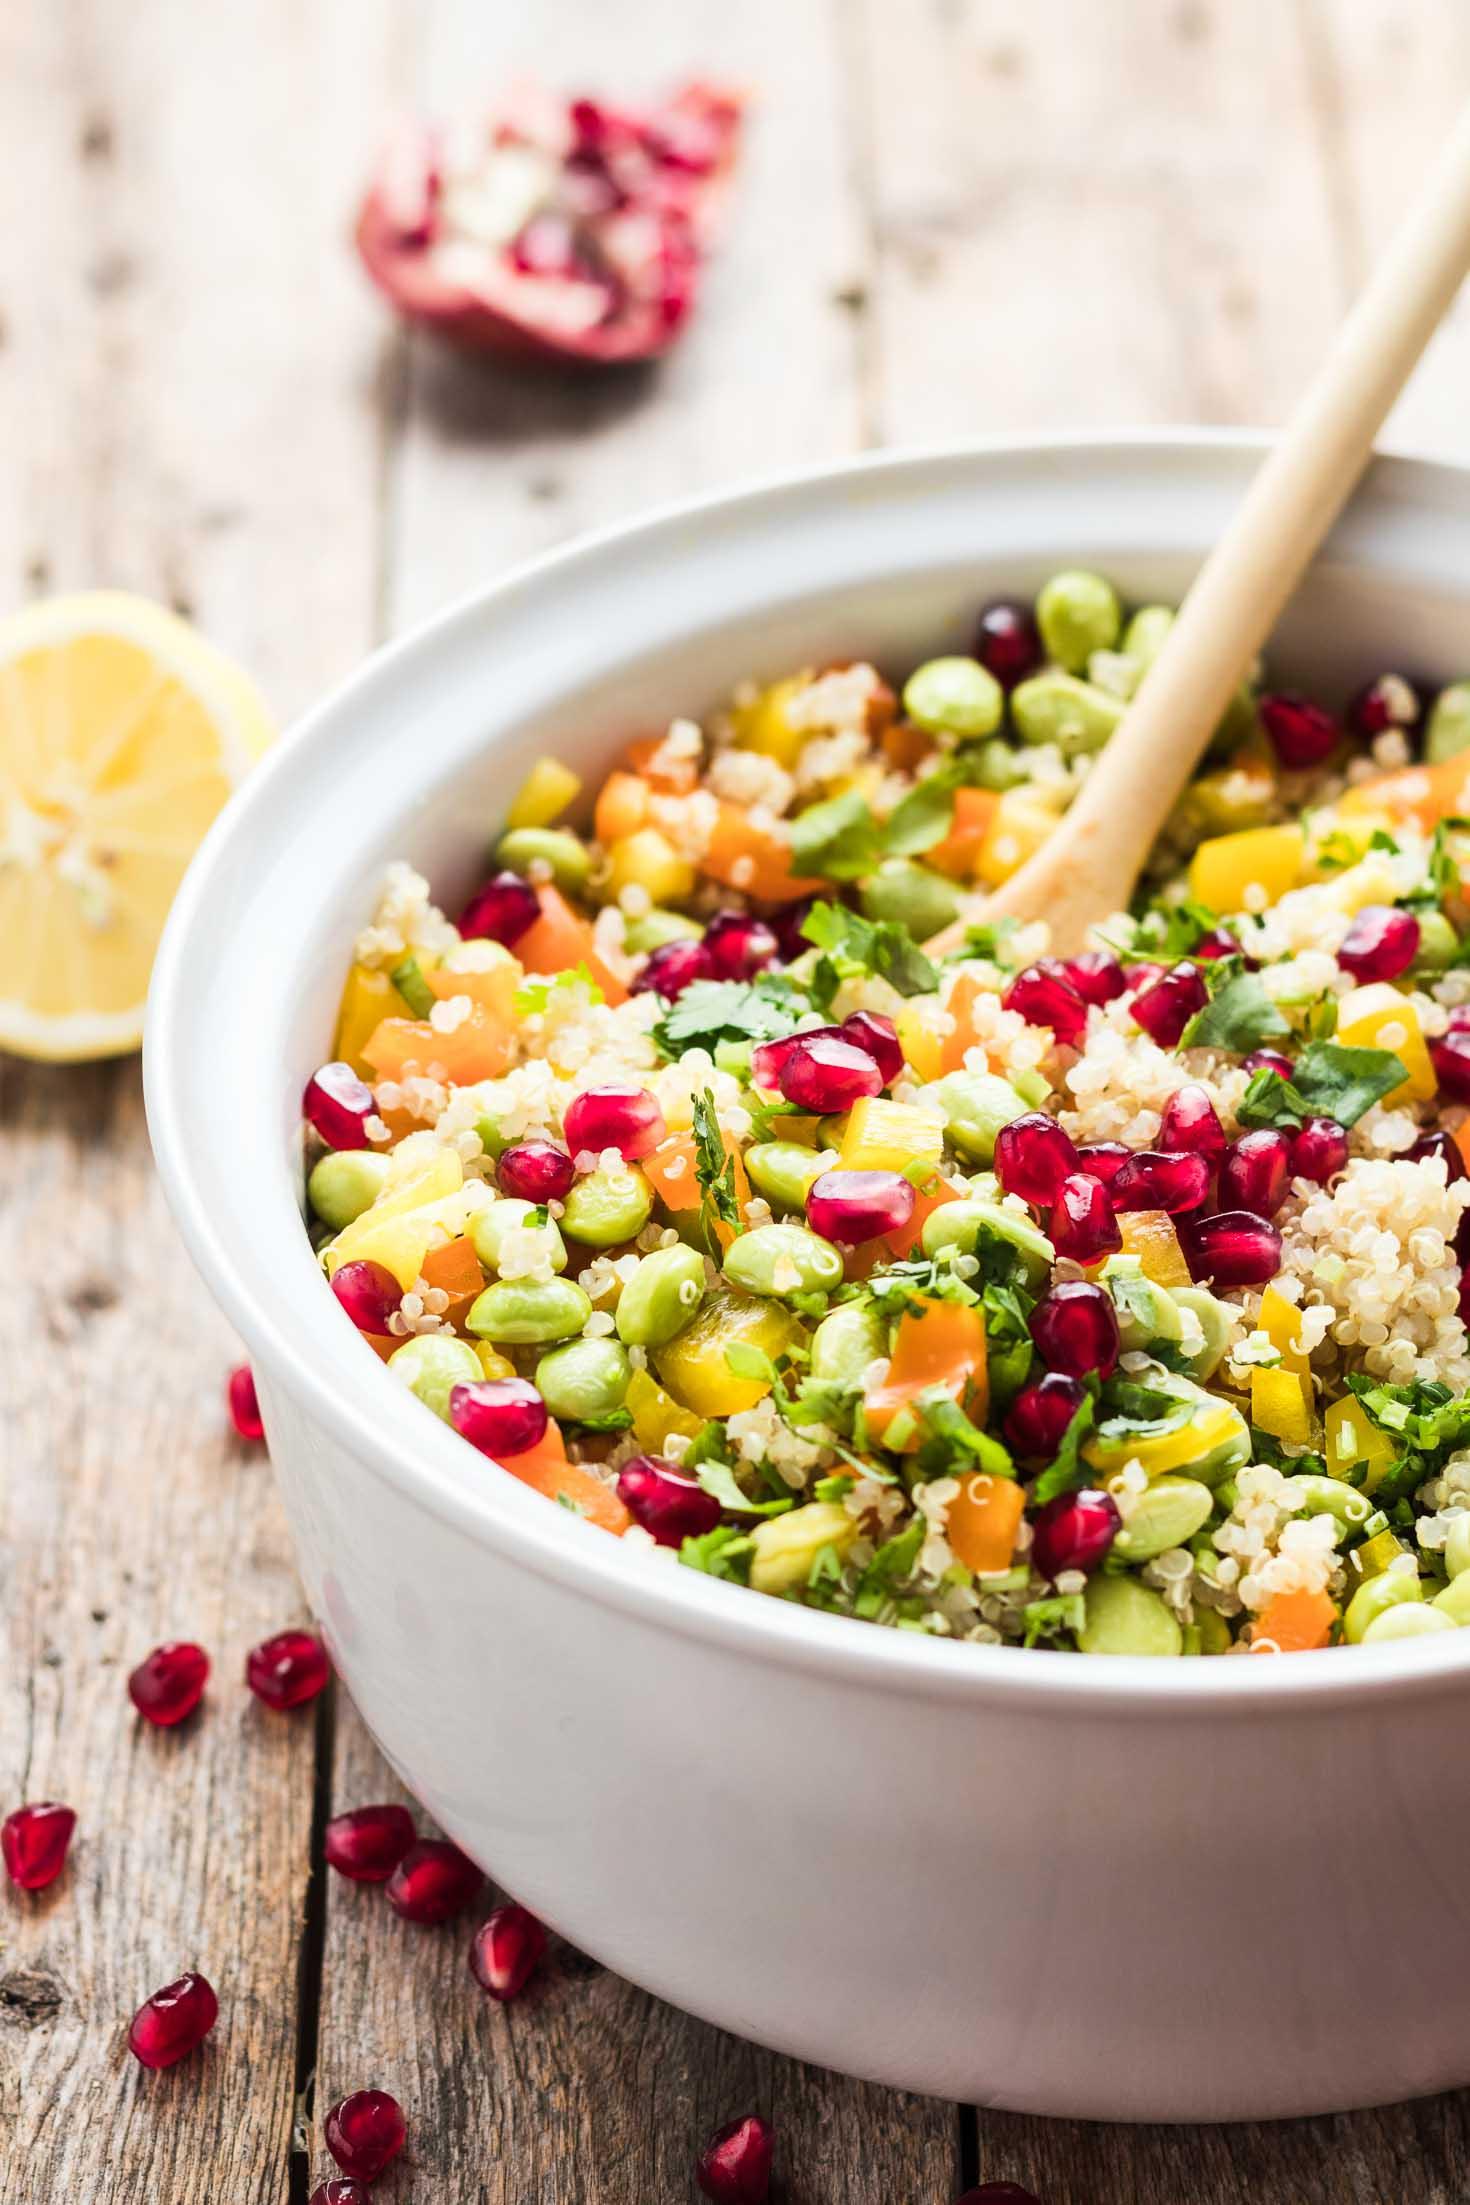 30-Minute Pomegranate Edamame Quinoa Salad-side view-in a white bowl